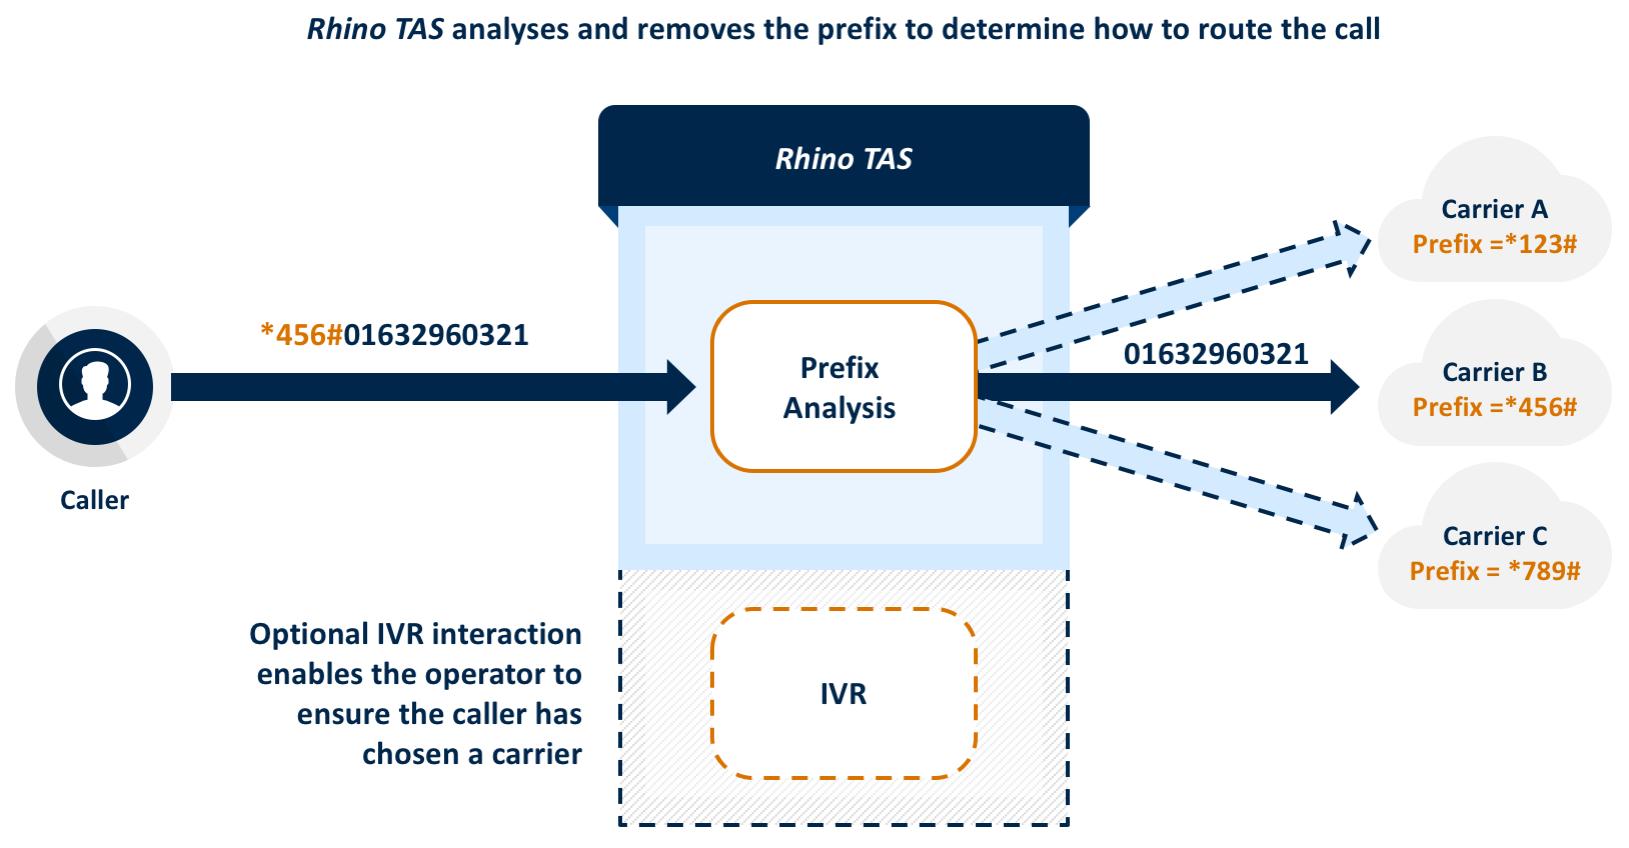 rhino-tas-app-user-defined-routing